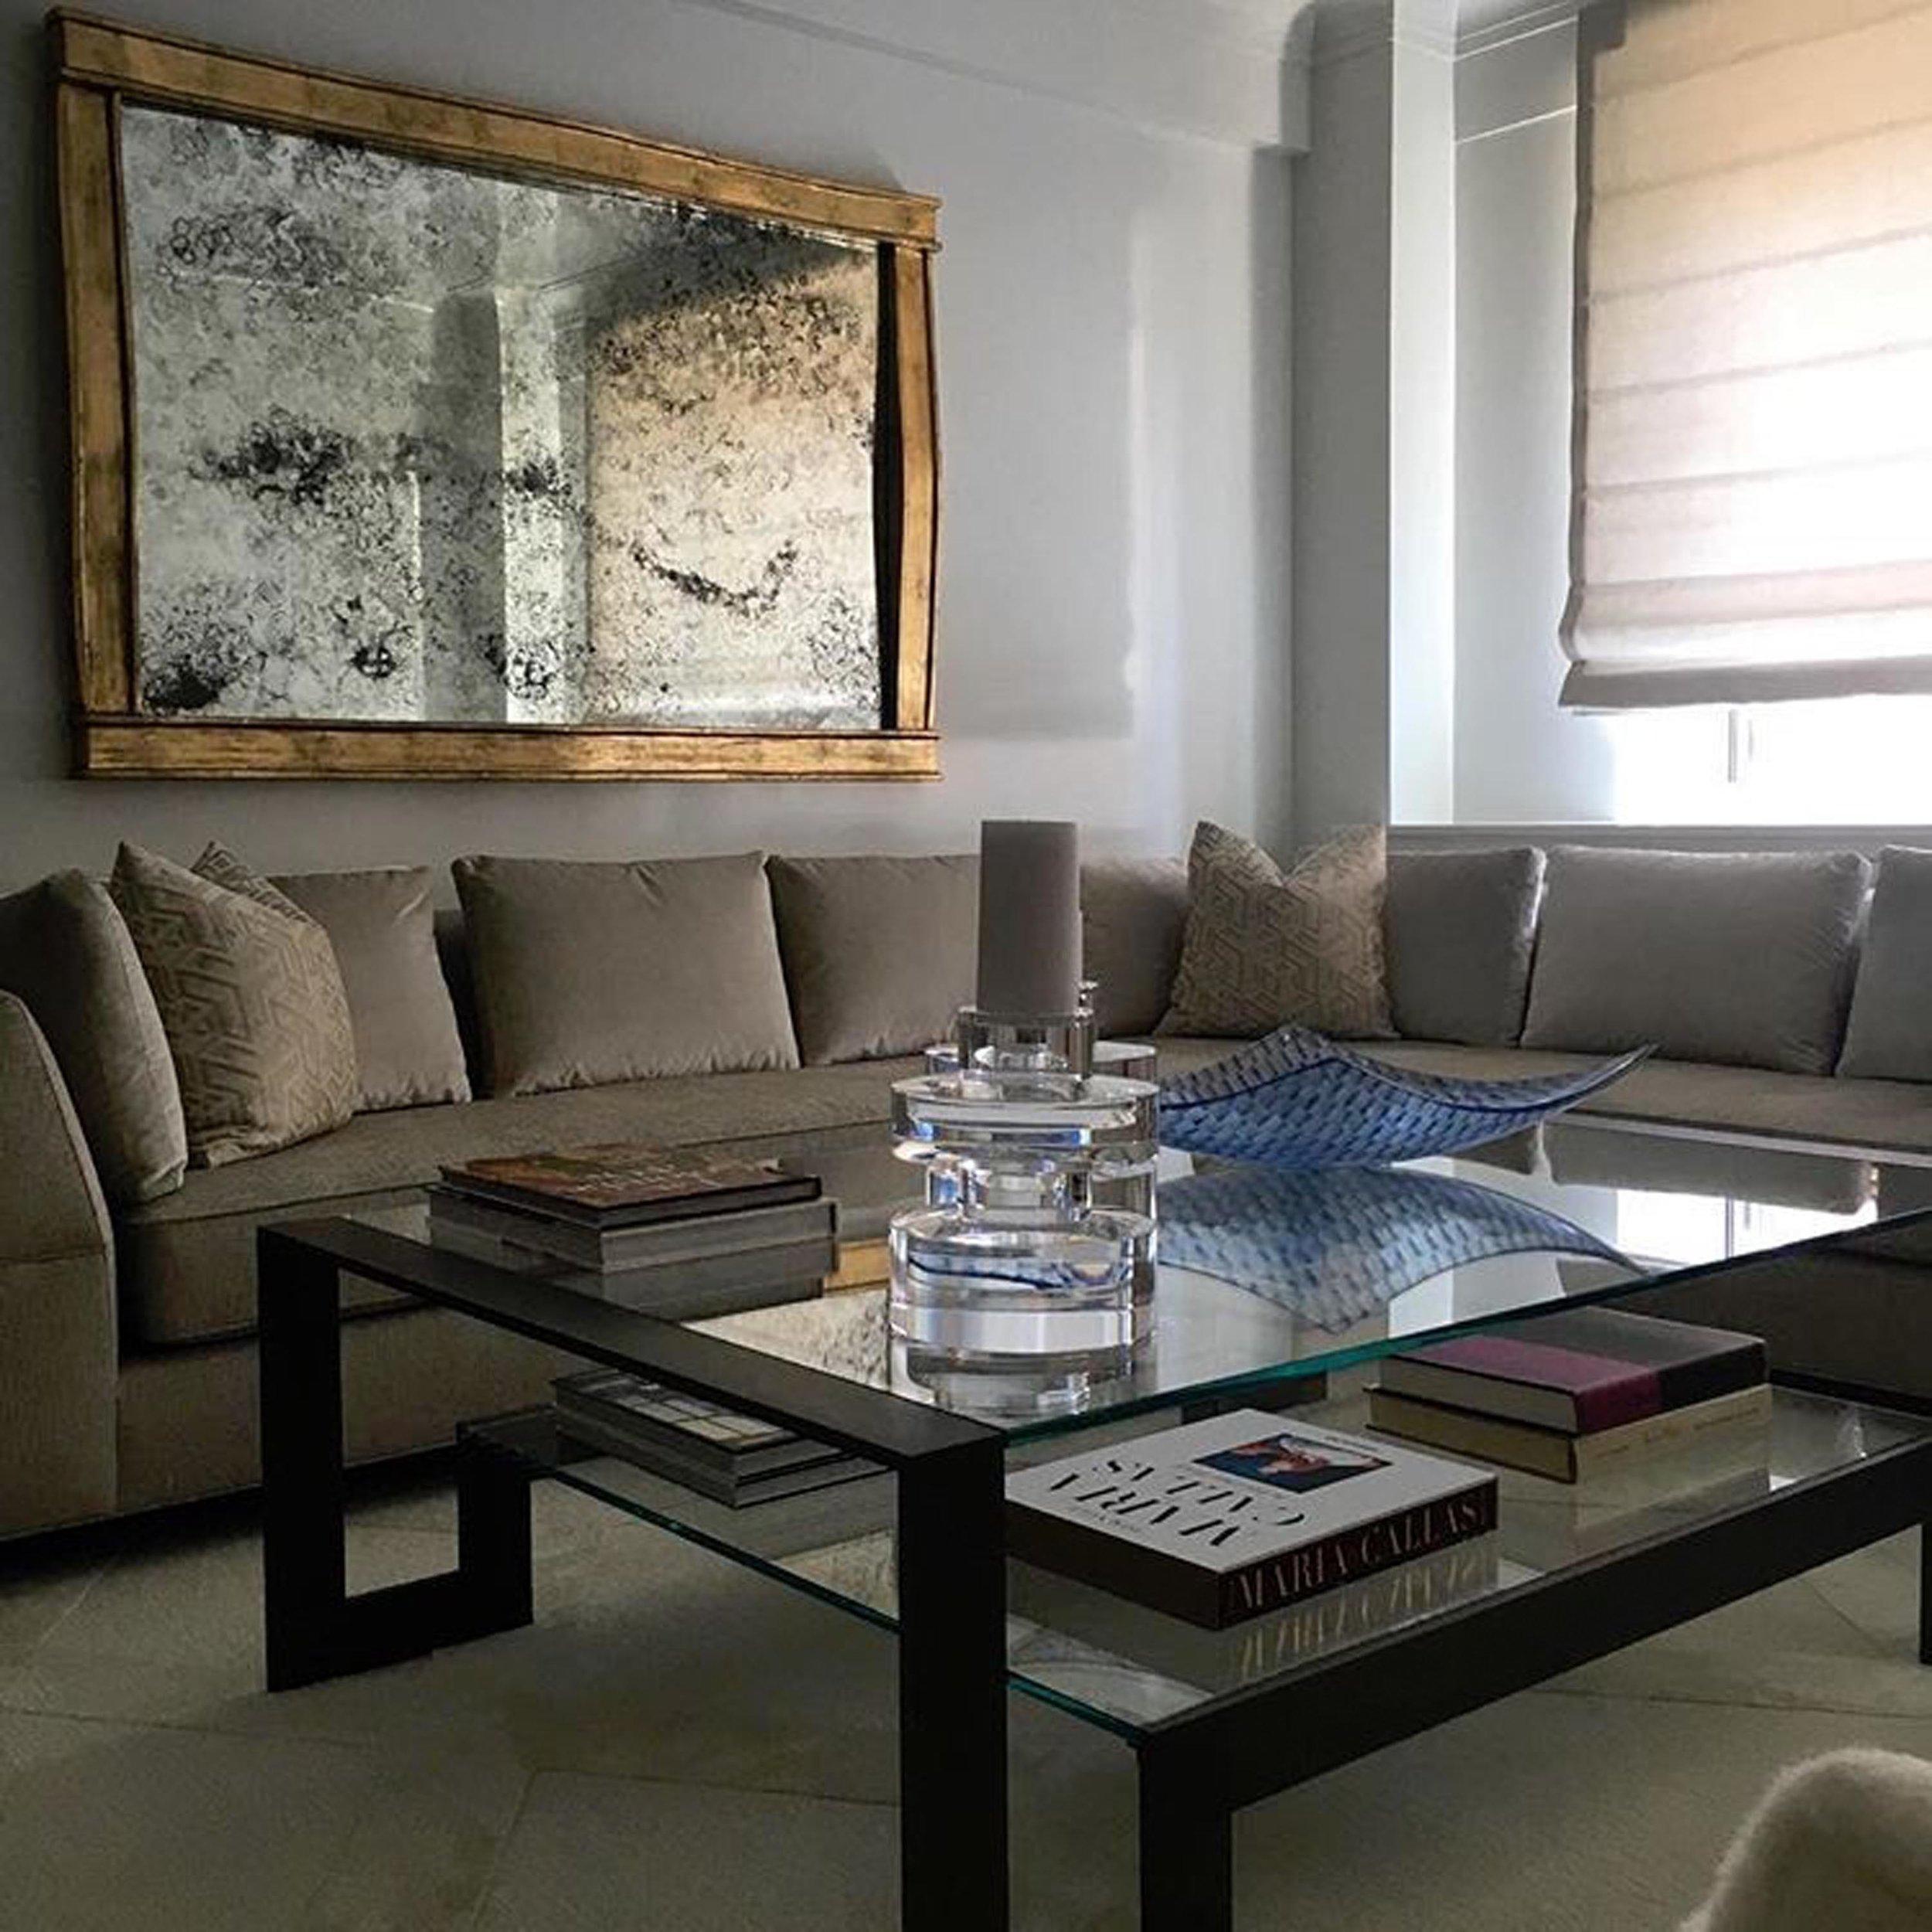 Textured brass rectangular framed mirror hanging over sectional sofa